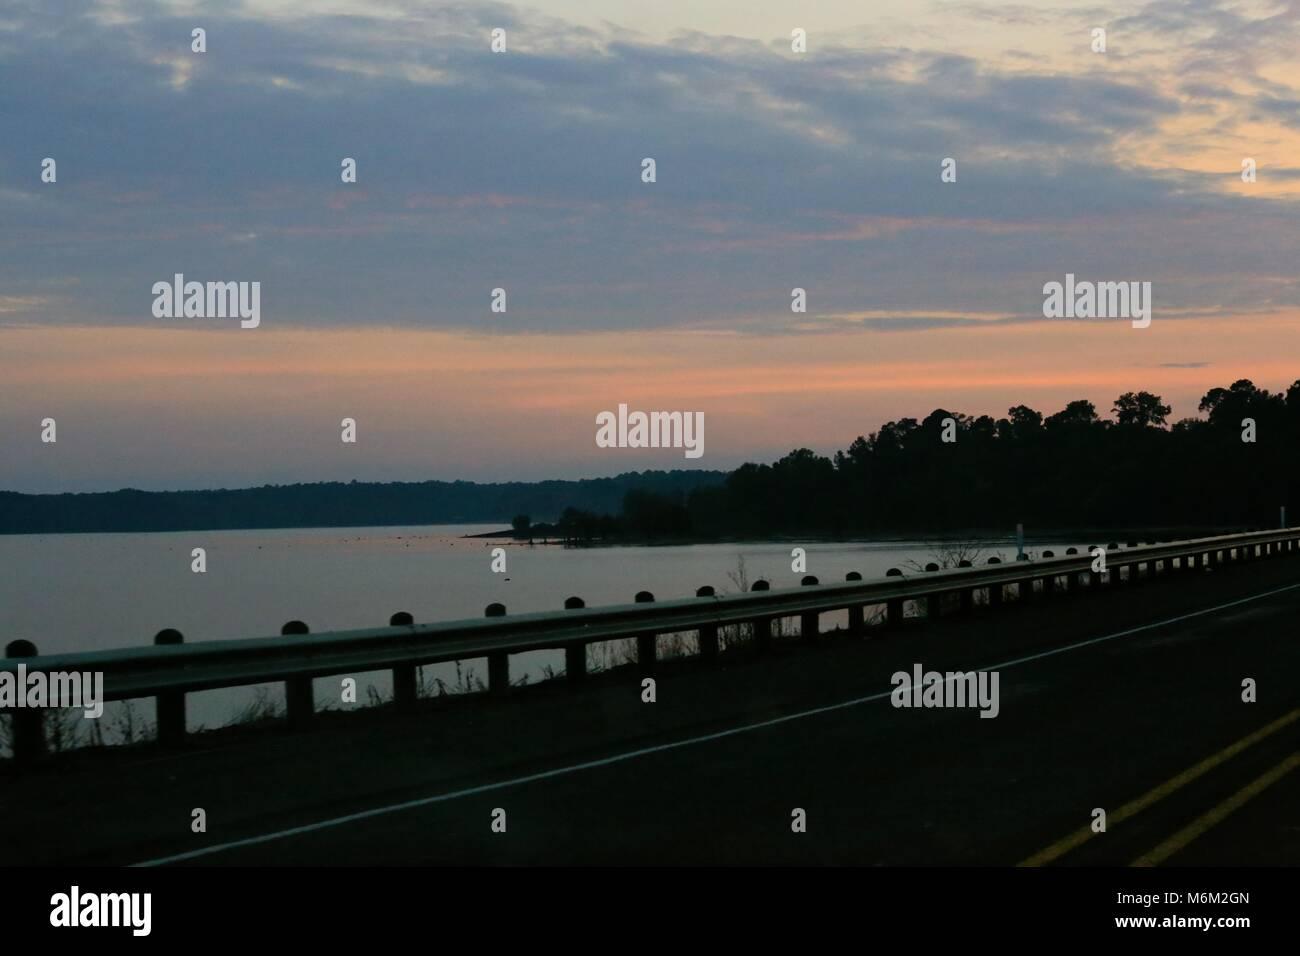 Sunset Sky over the Toledo Bend Reservoir - Stock Image